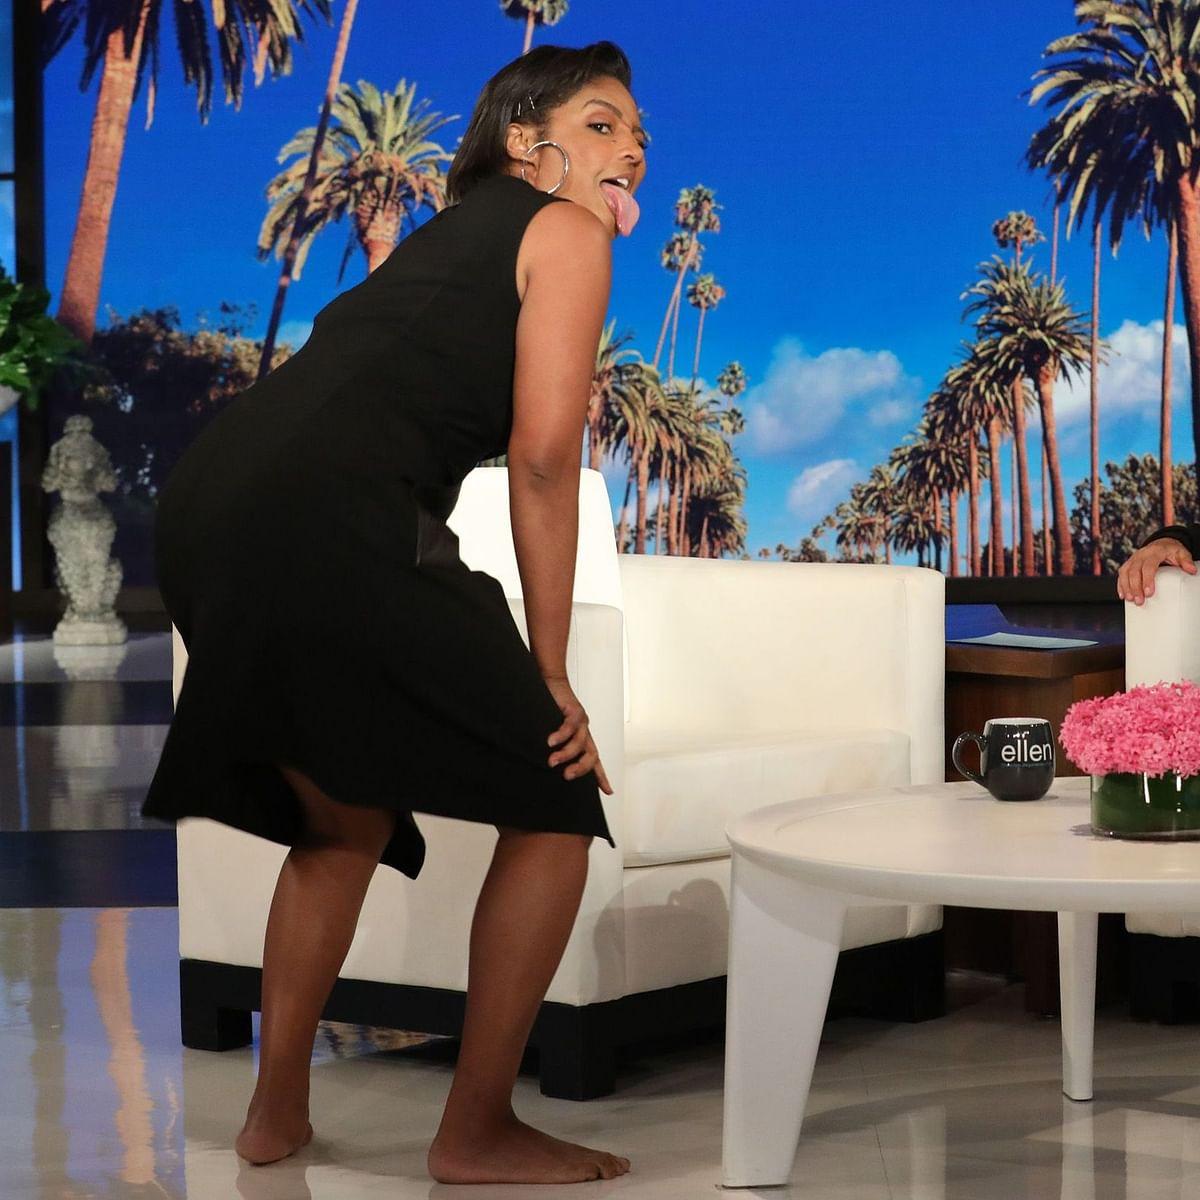 Is Tiffany Haddish replacing Ellen DeGeneres on the talk show? Actor-comedian reacts